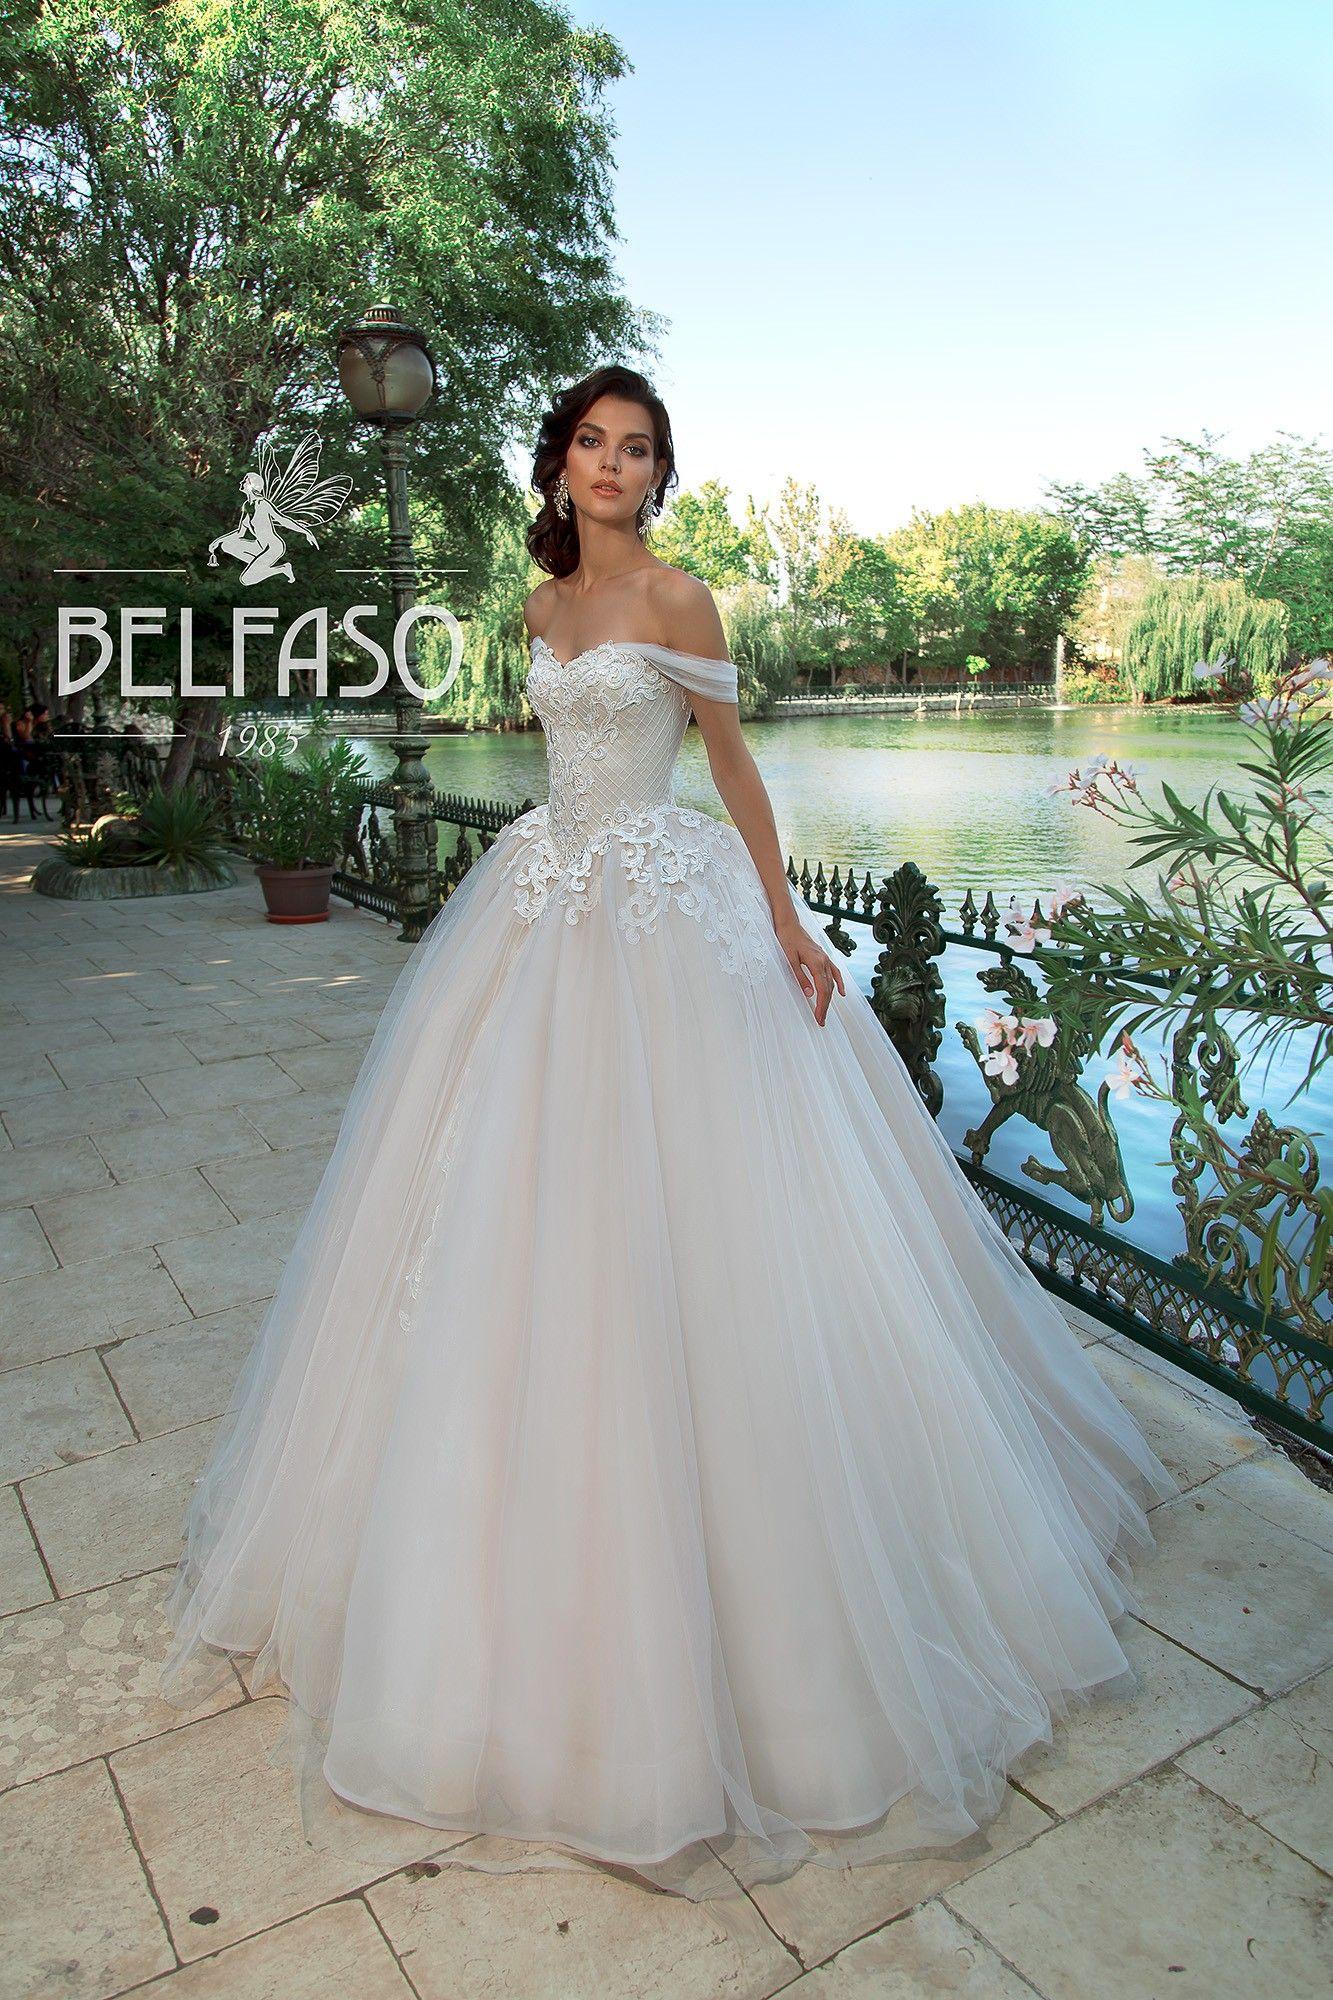 Pin By Derya Yaman On Wedding Dresses Princess Wedding Dresses Wedding Dresses Cinderella Ballroom Wedding Dresses [ 2000 x 1333 Pixel ]